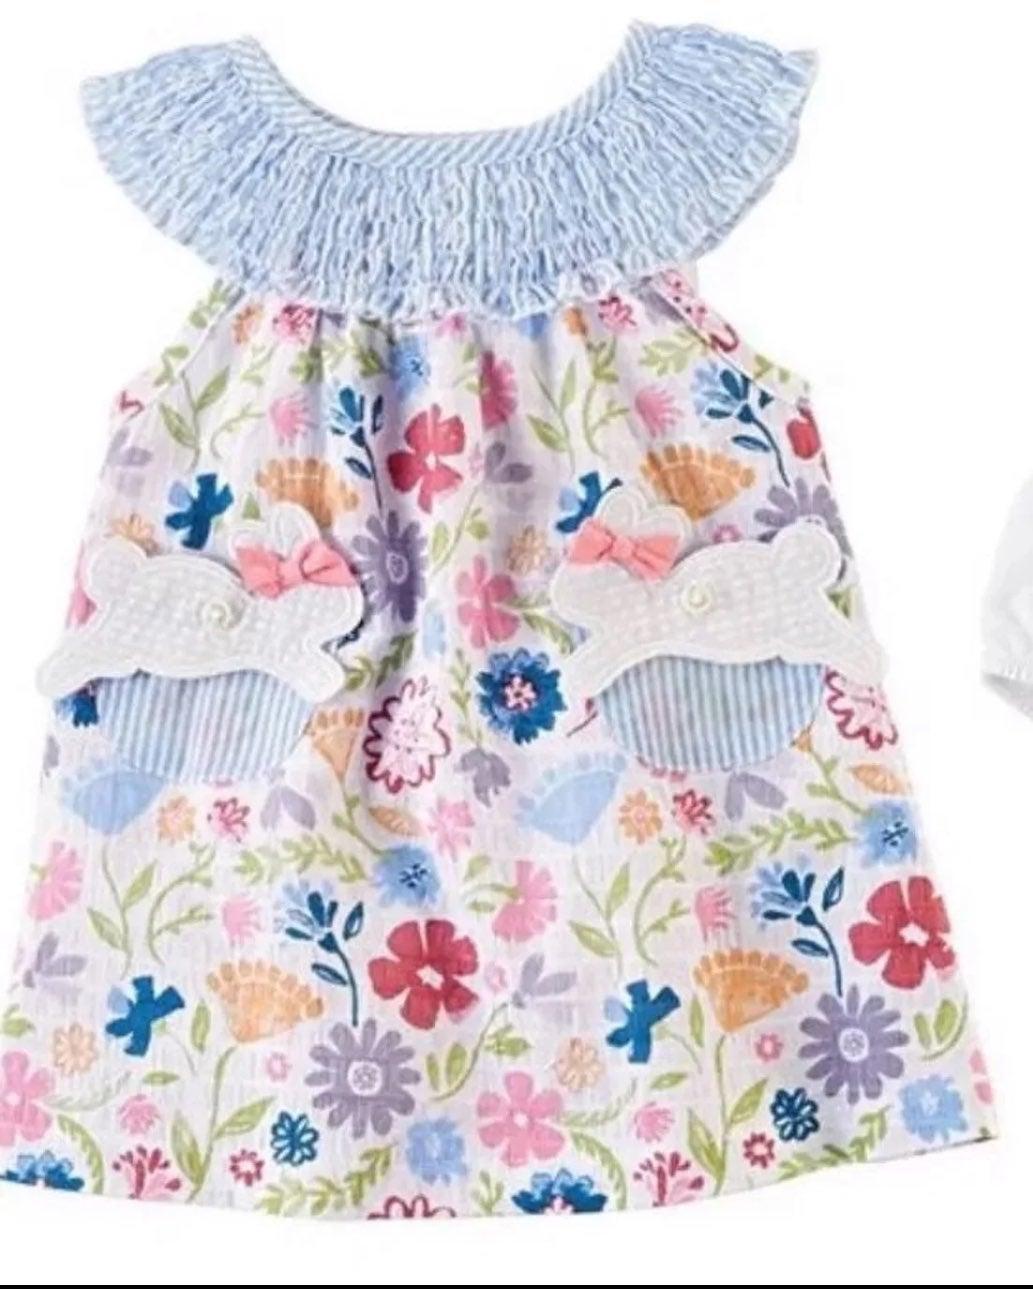 Mudpie Spring/ Dress 4T NWT